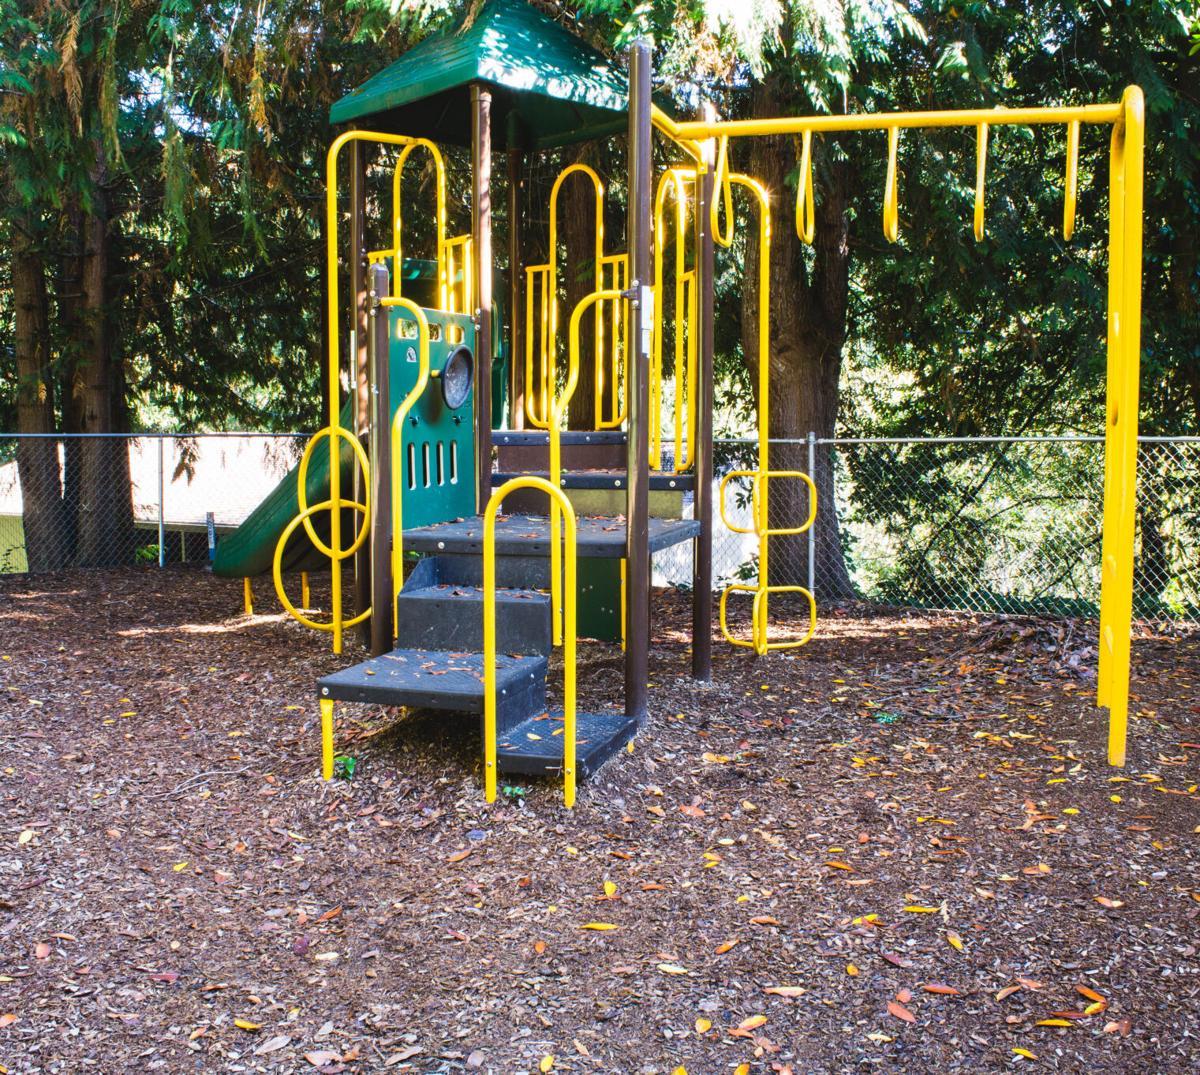 Hillside Terrace playground, Coquille